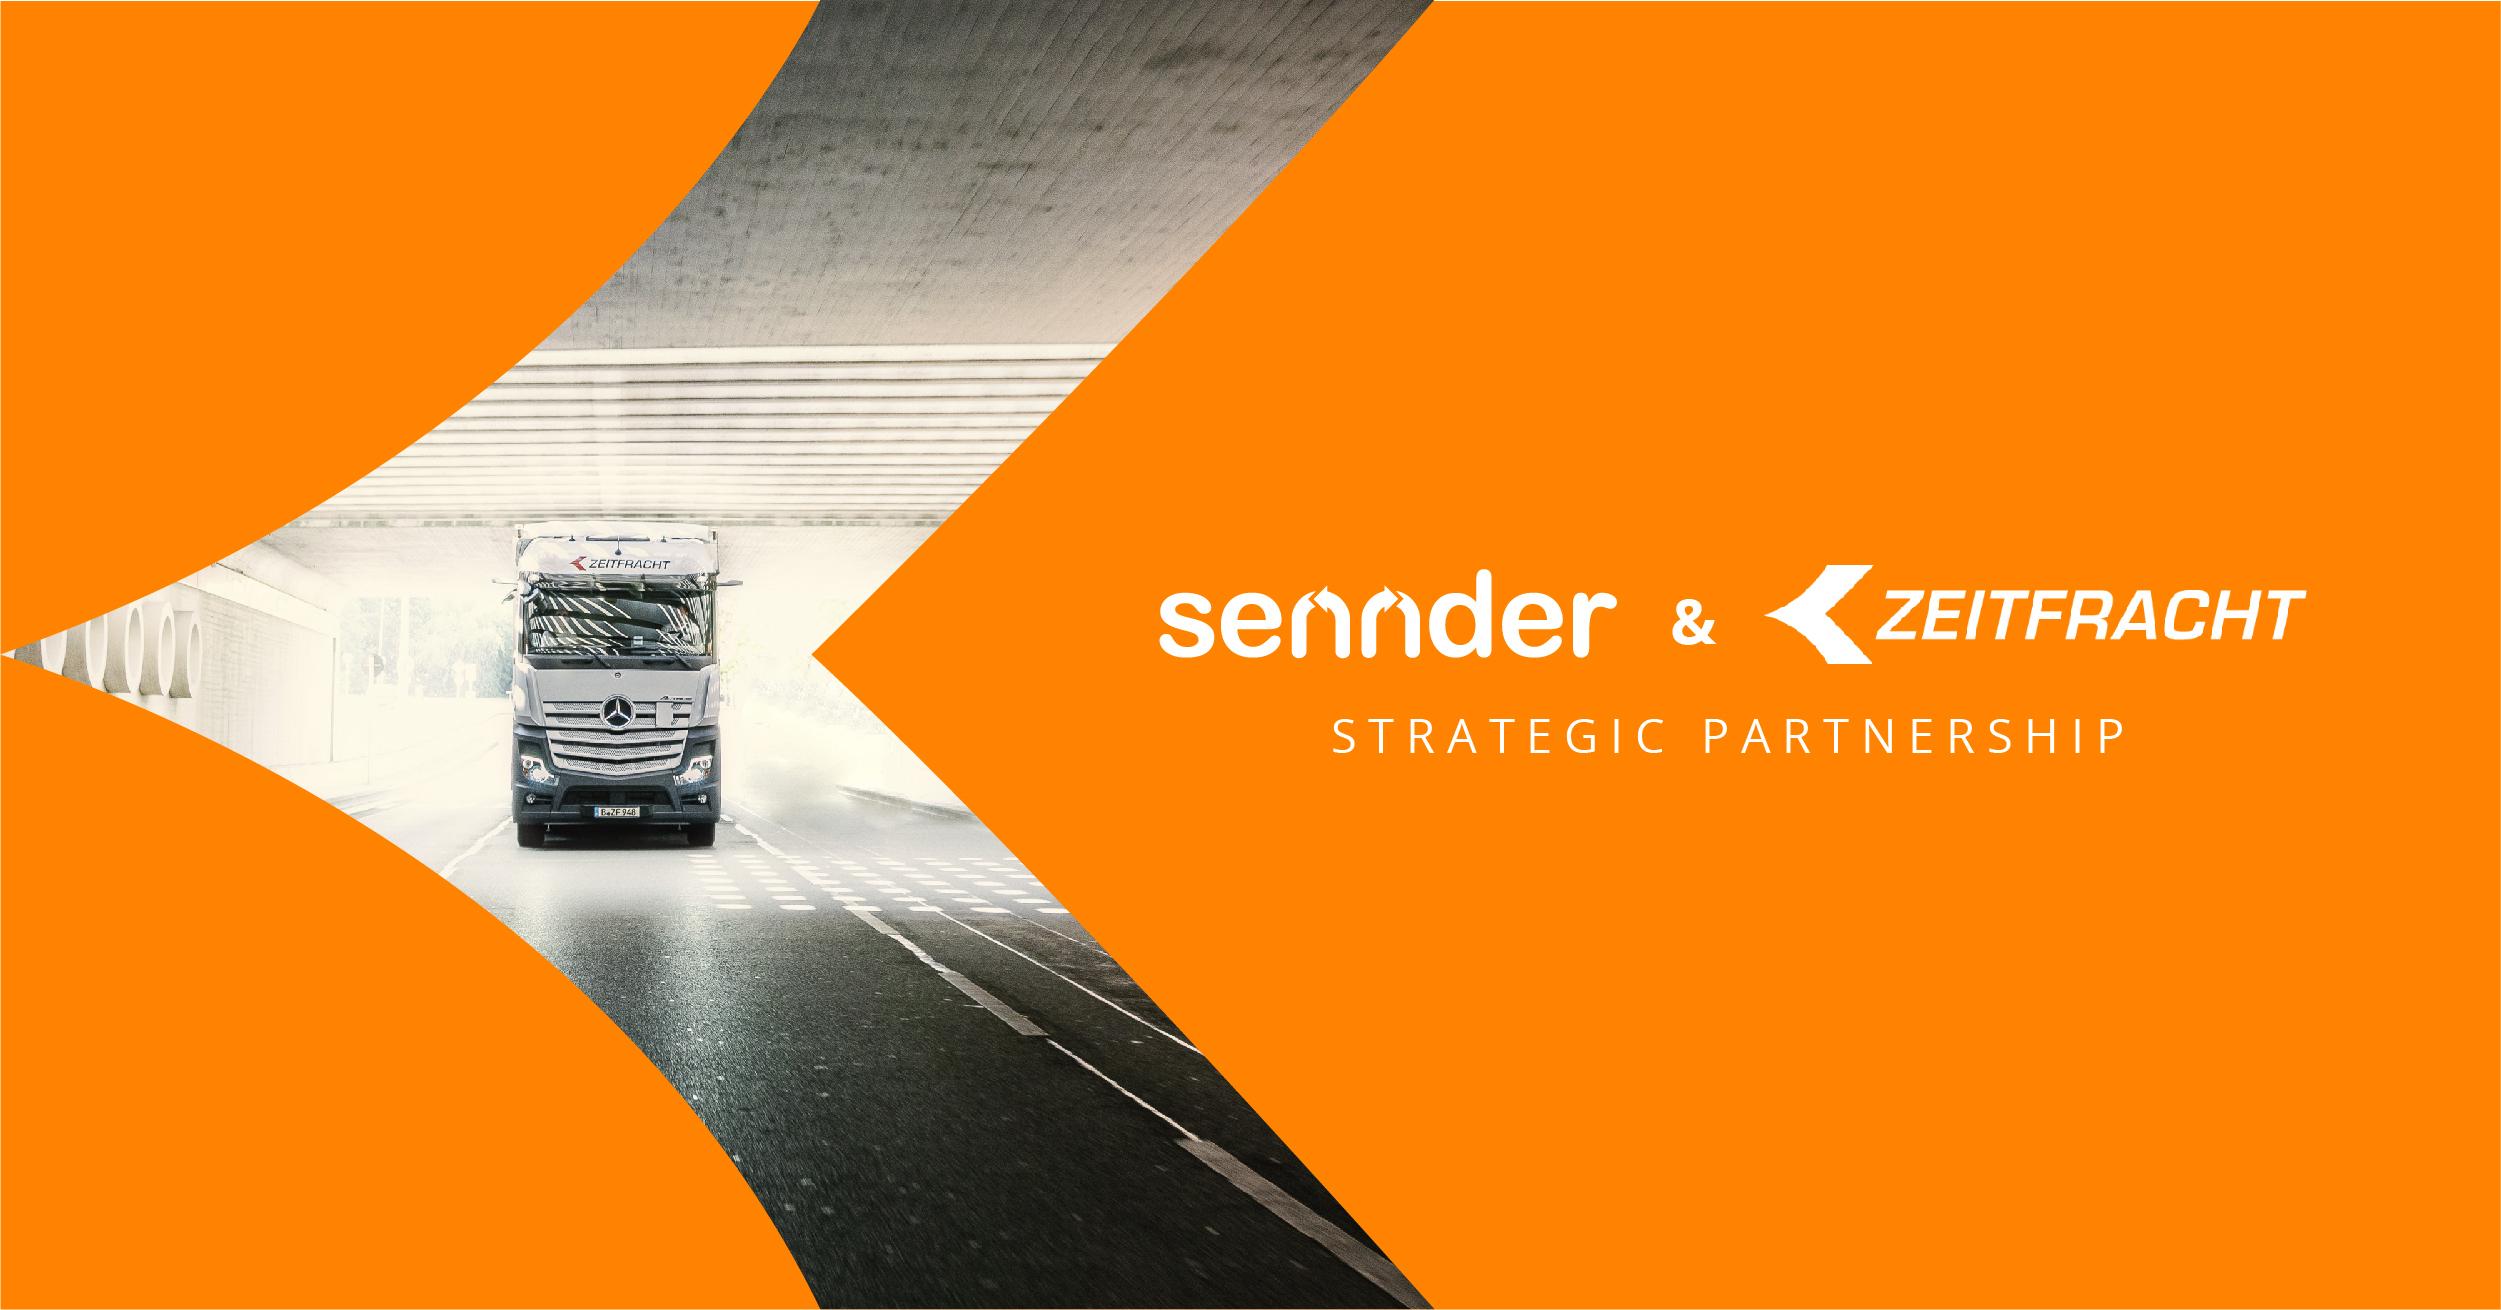 sennder licenses SaaS platform to Zeitfracht in new strategic partnership